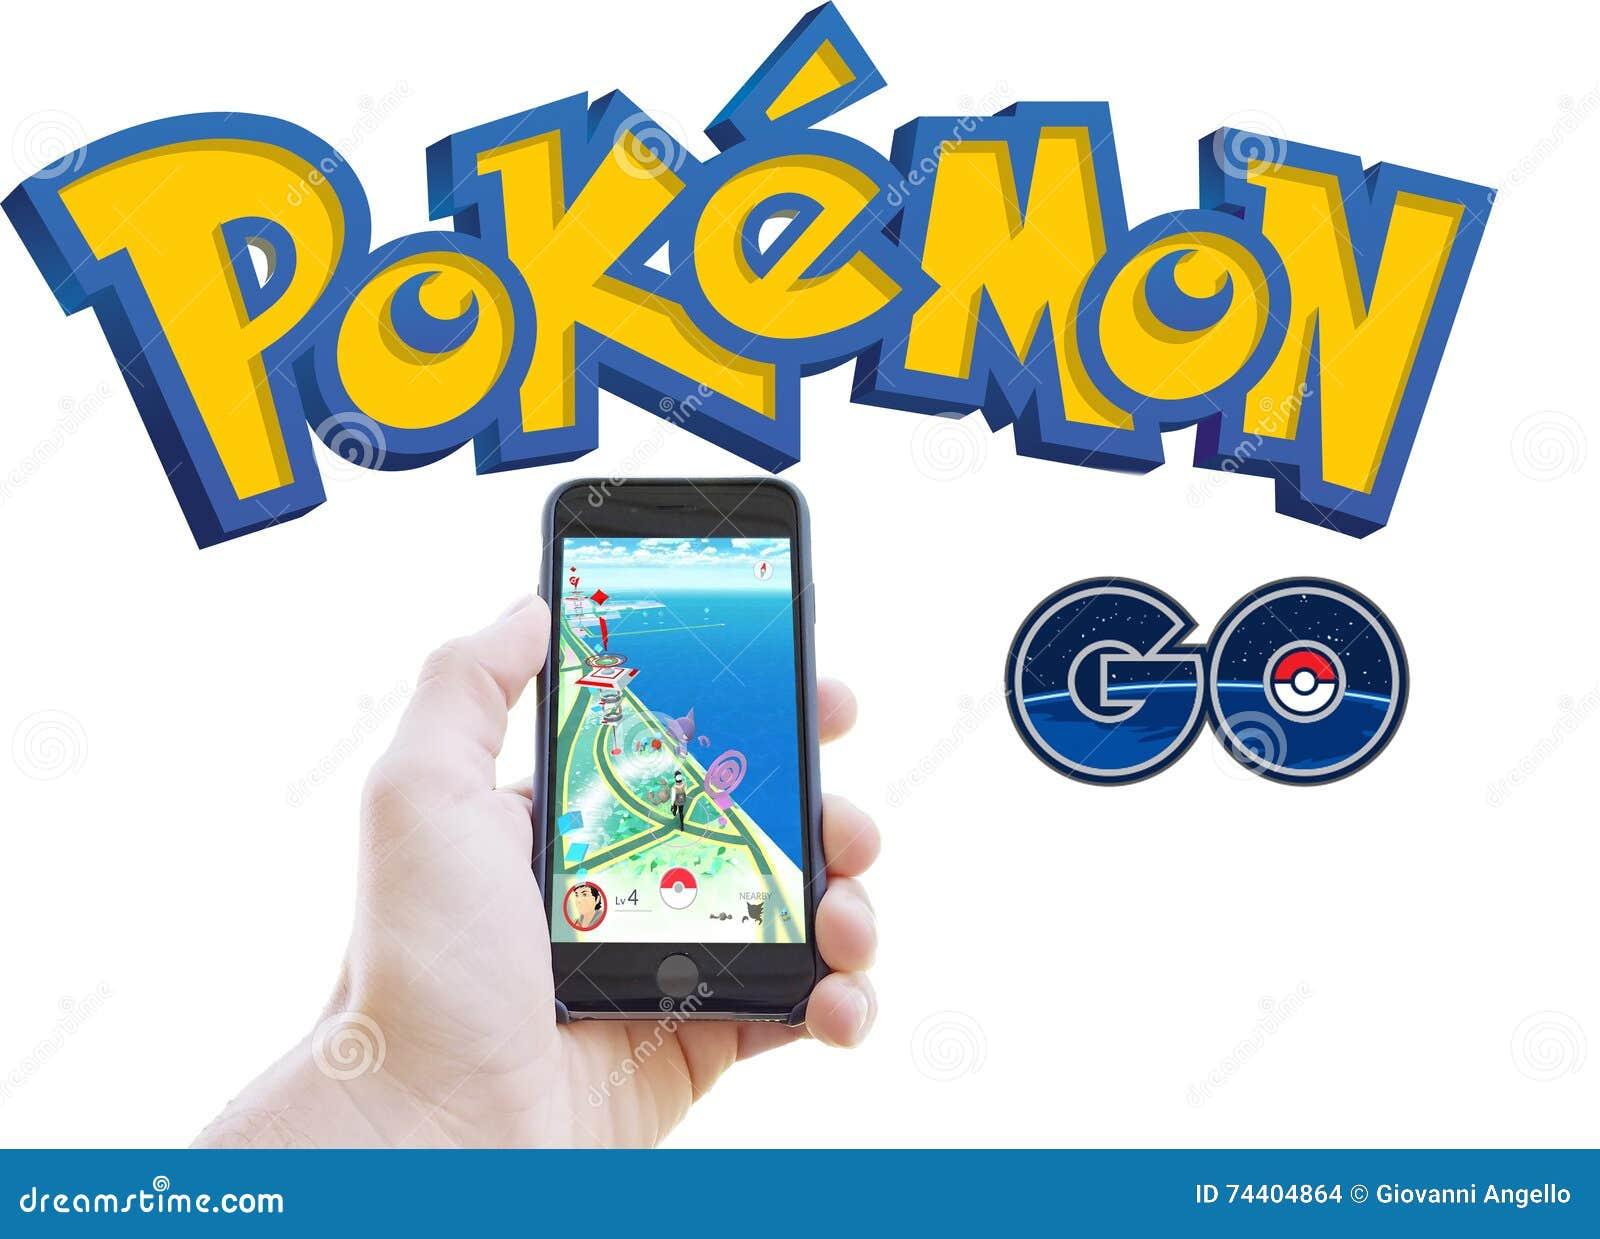 Pokemon go app and logo isolated